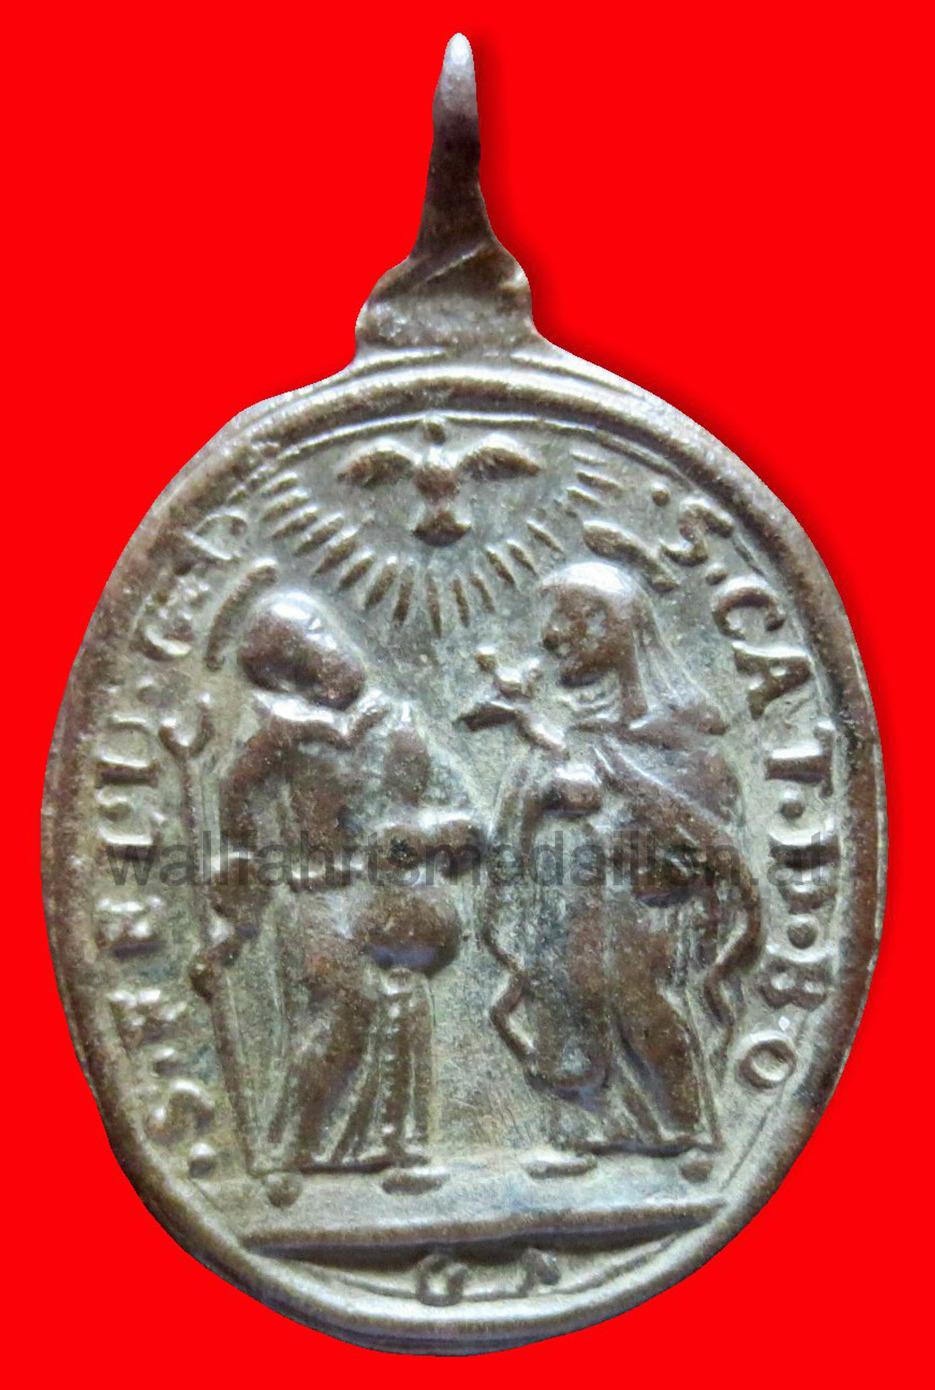 Felix von Cantalice, Katharina von Bologna